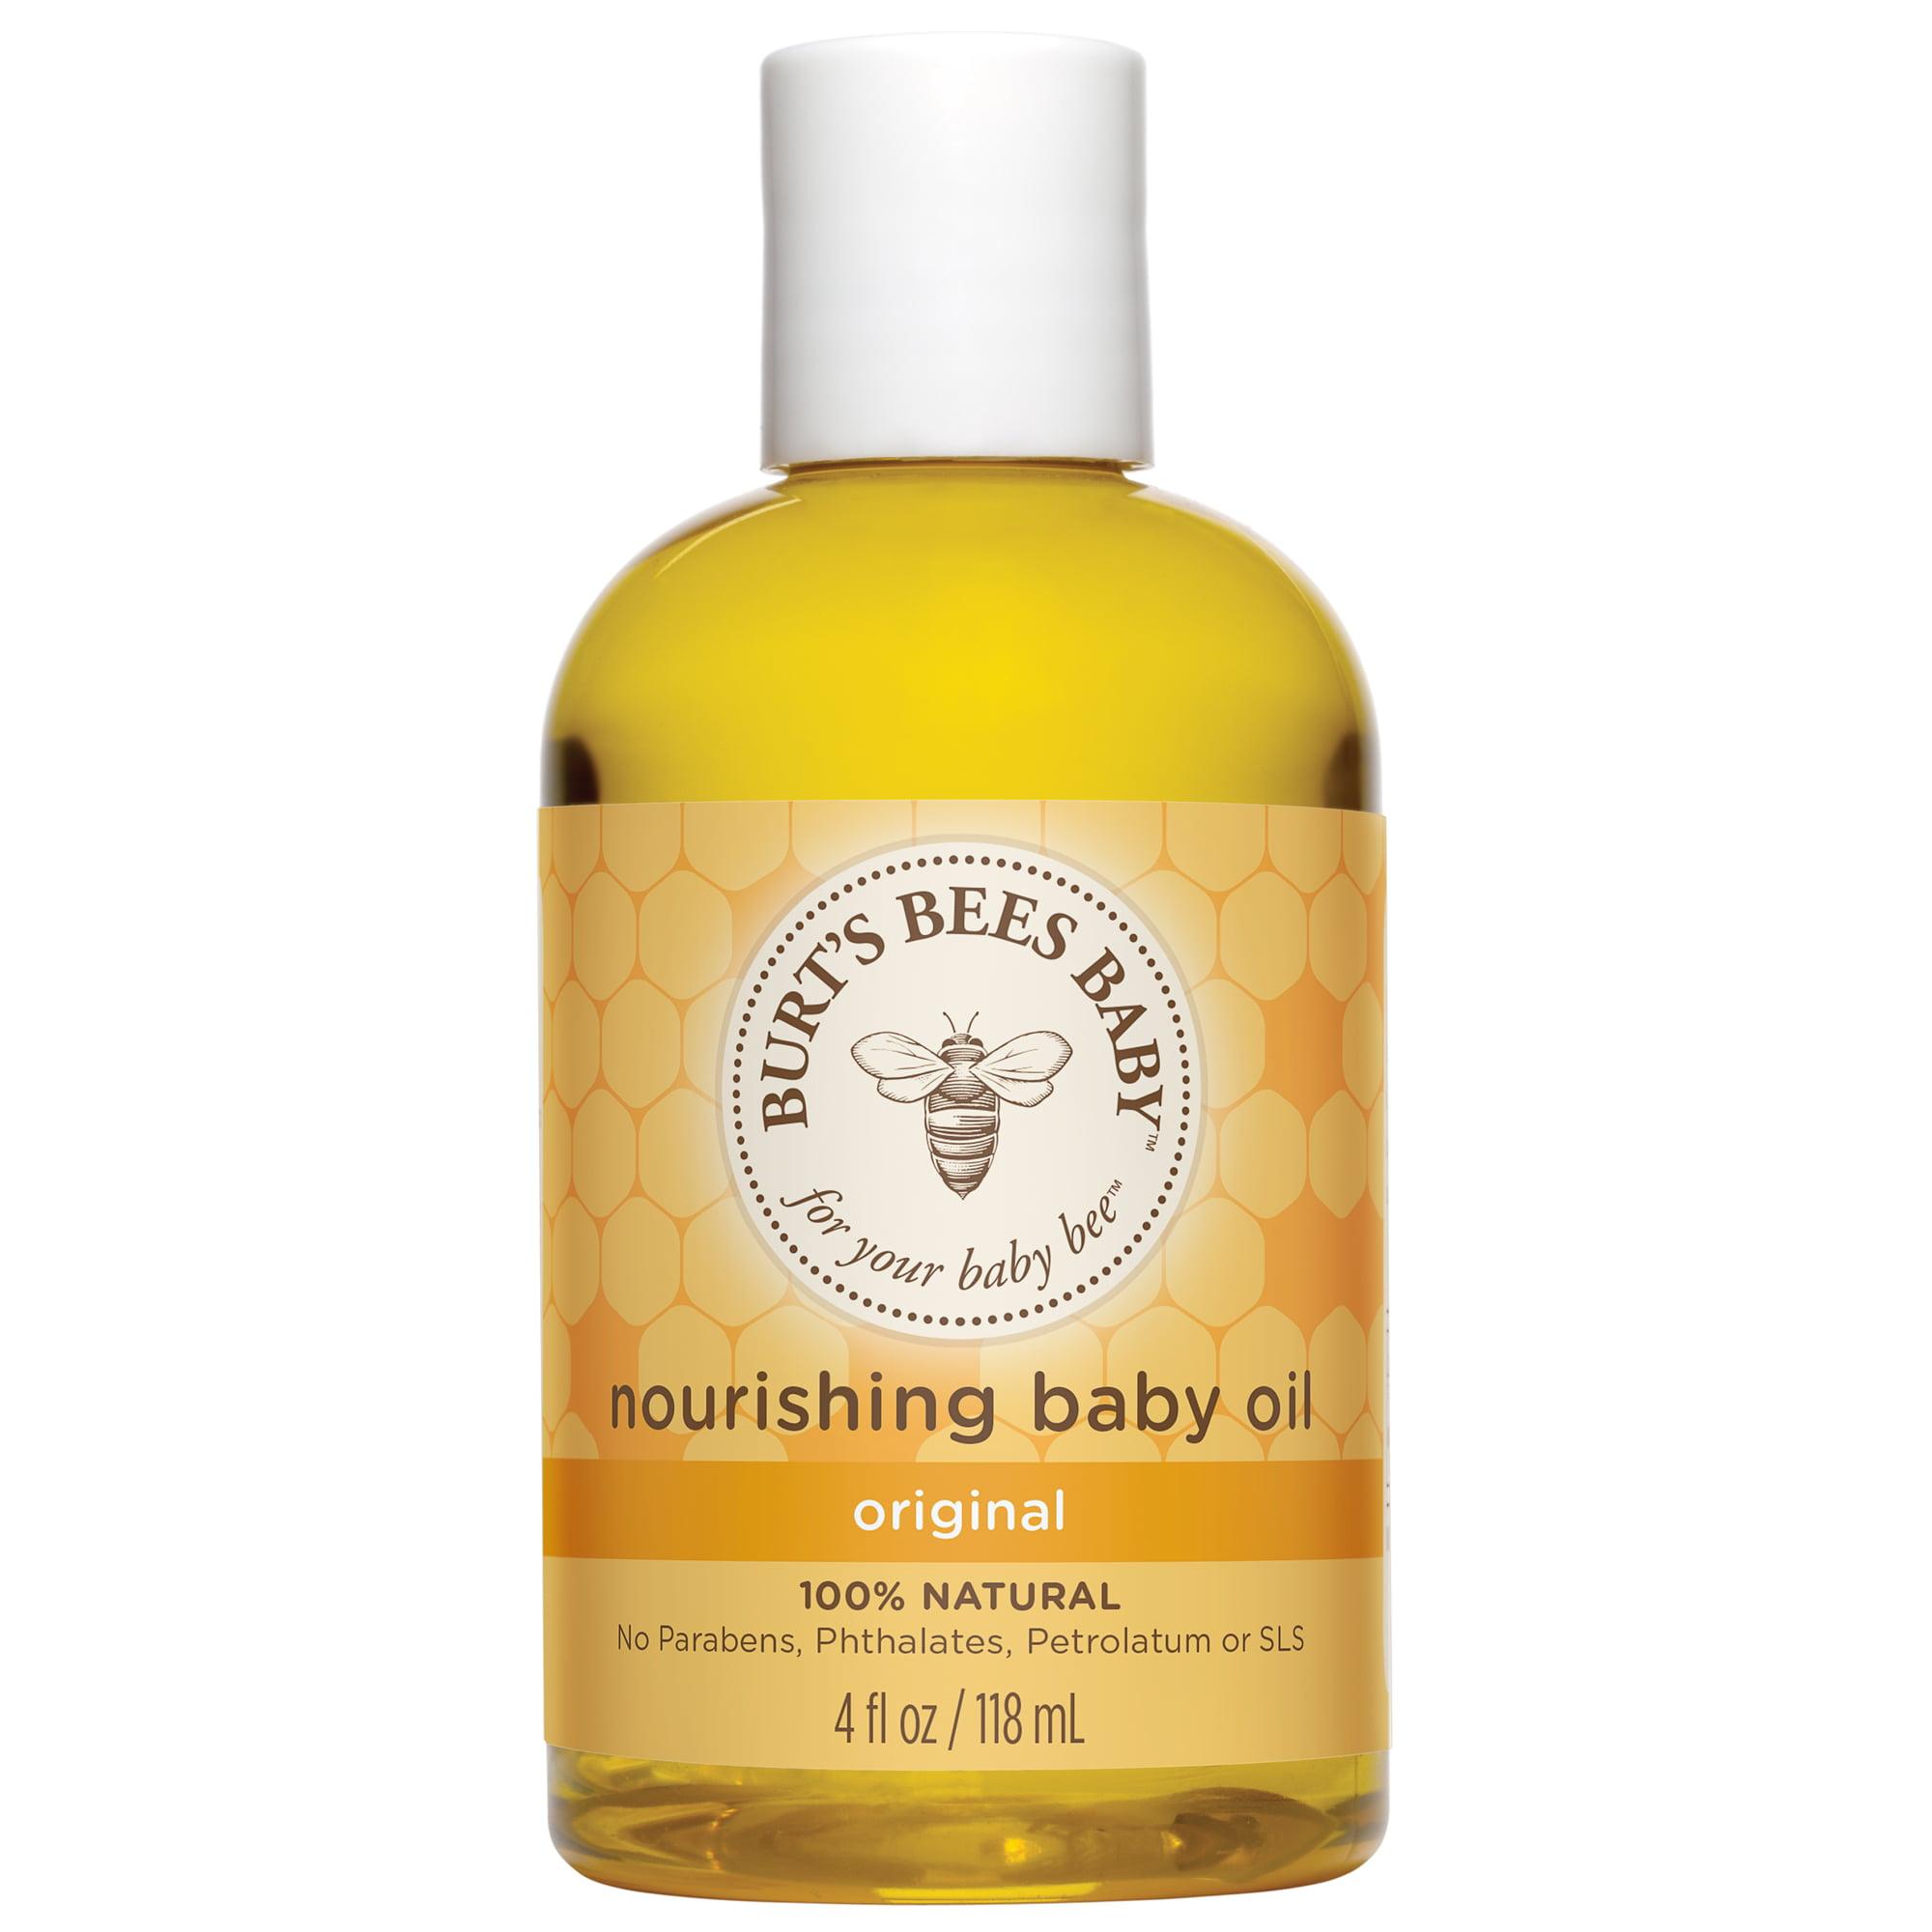 Burt's Bees Baby Nourishing Baby Oil, 100% Natural Baby Skin Care - 4 oz Bottle